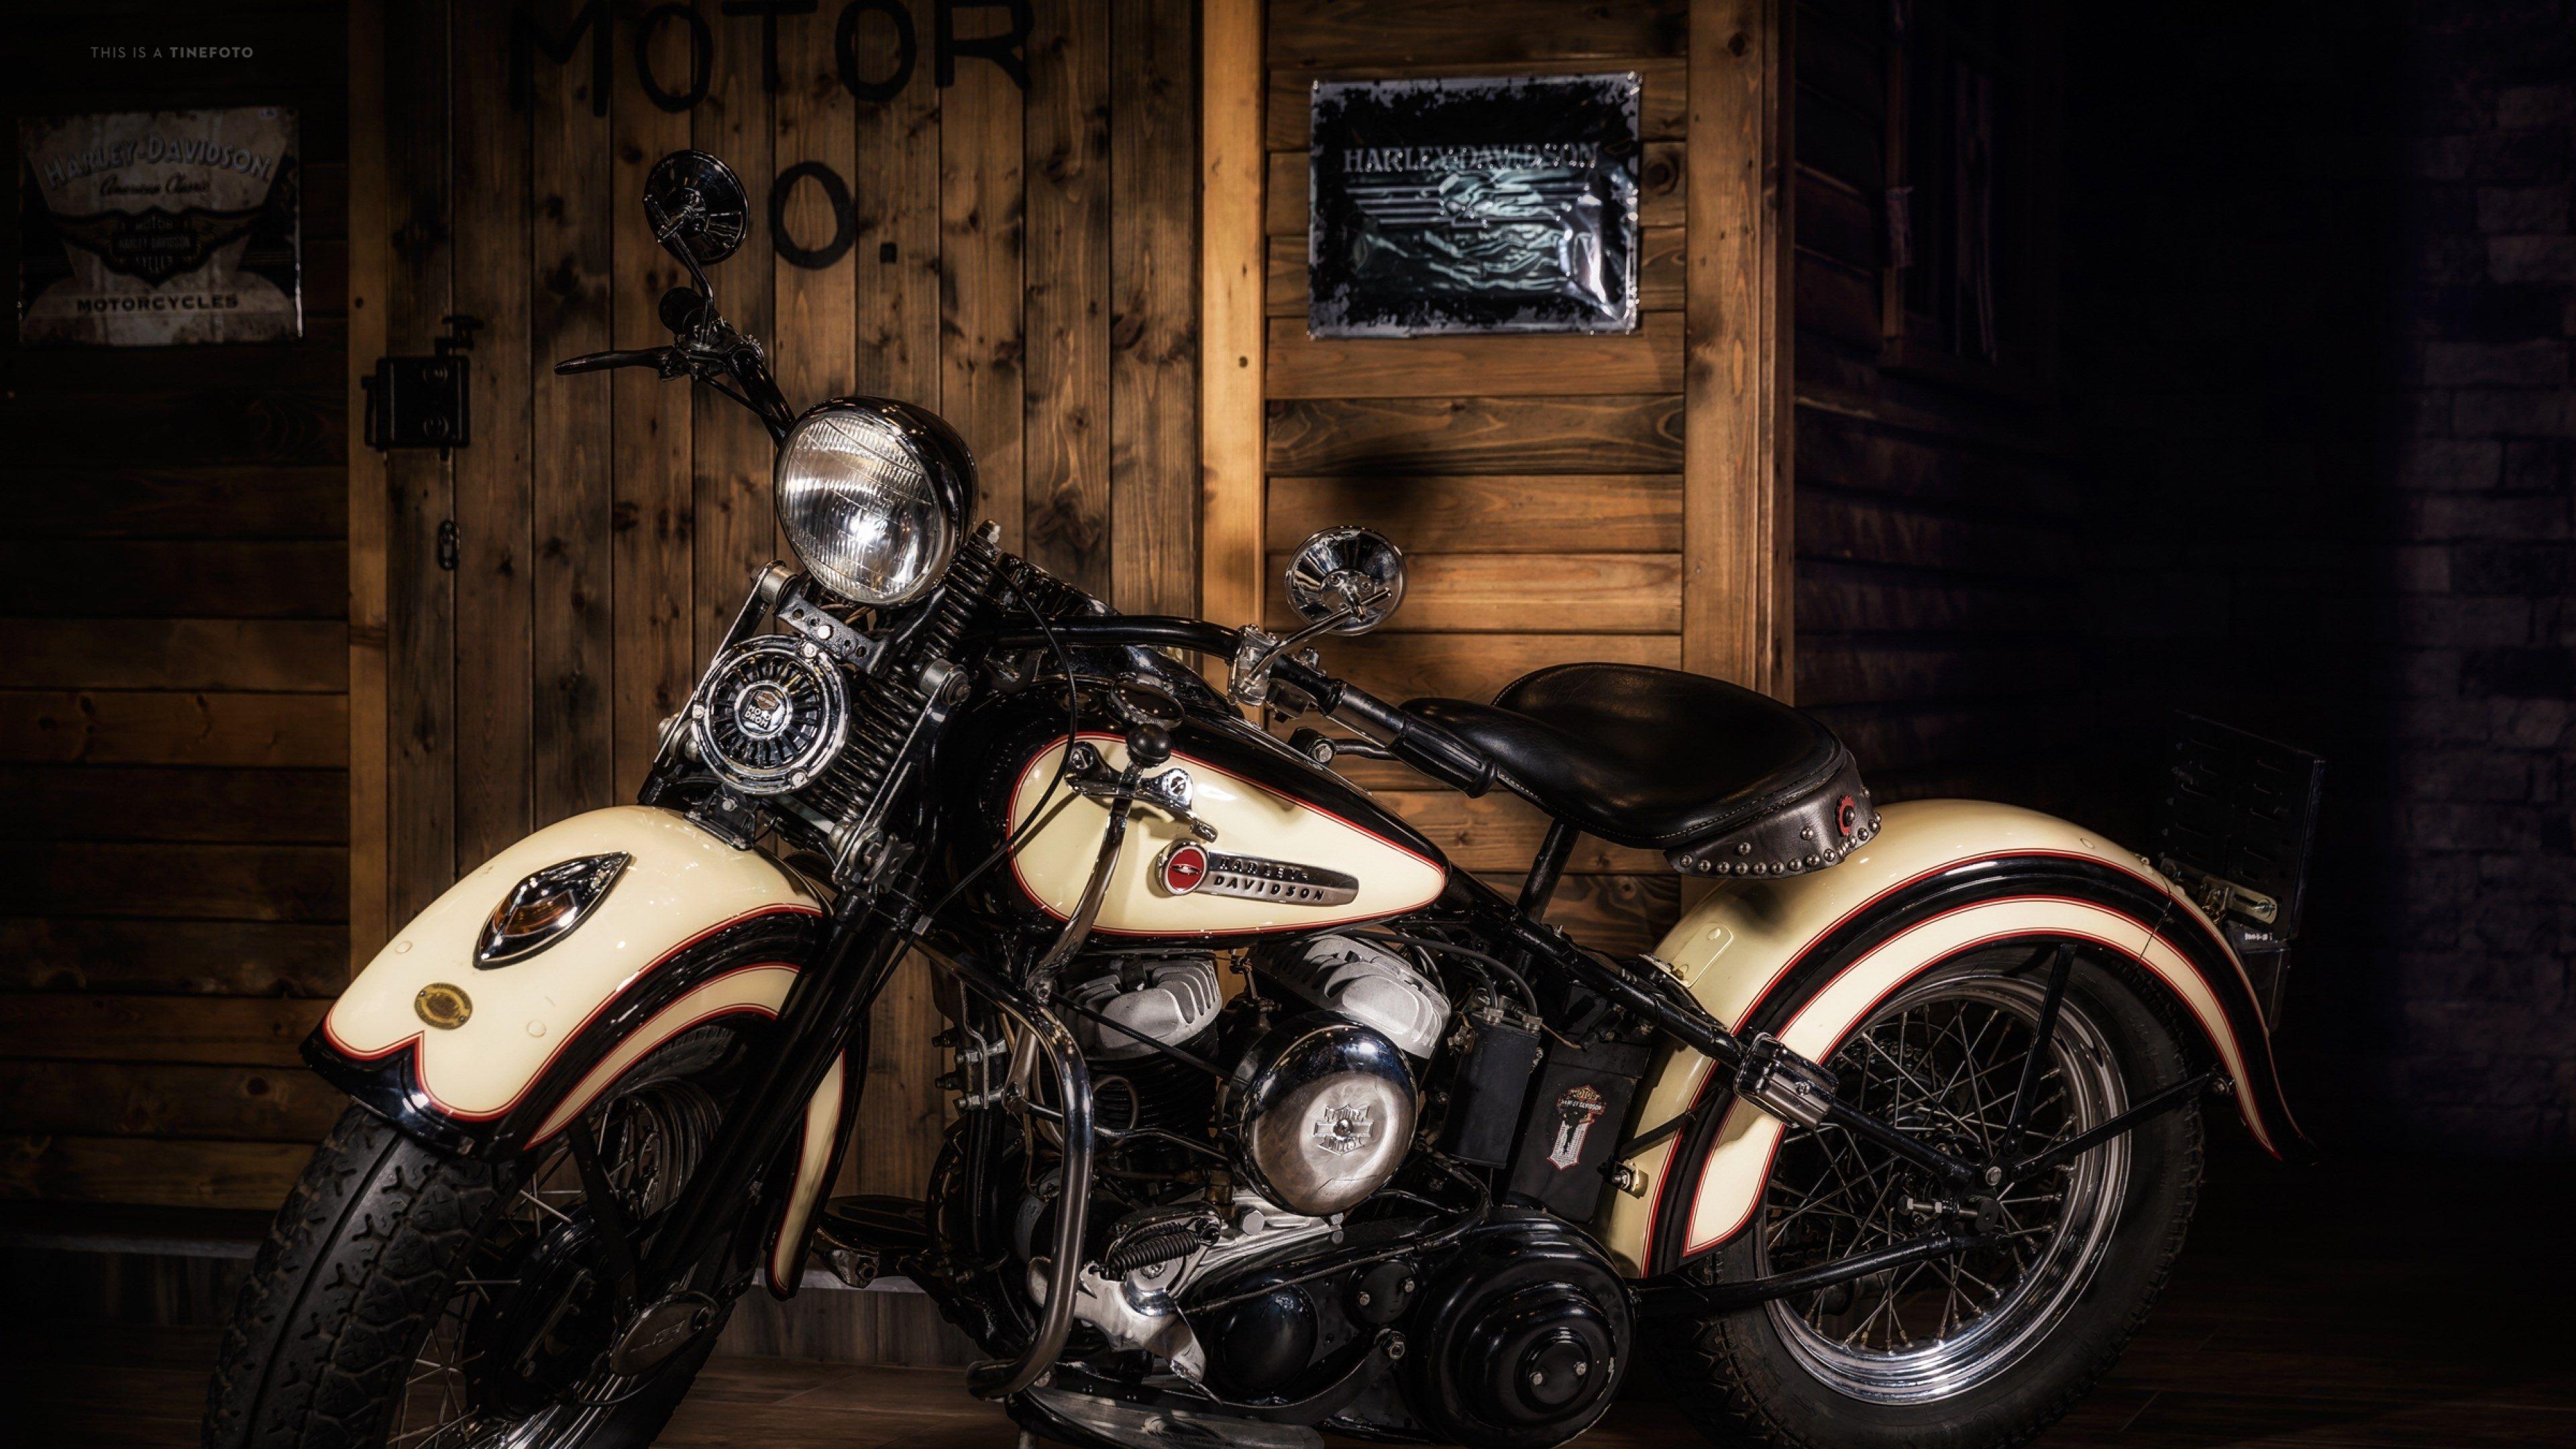 3840x2160 Harley Davidson 4k Wallpaper Hq Motocikly Harley Davidson Motocikl Oboi